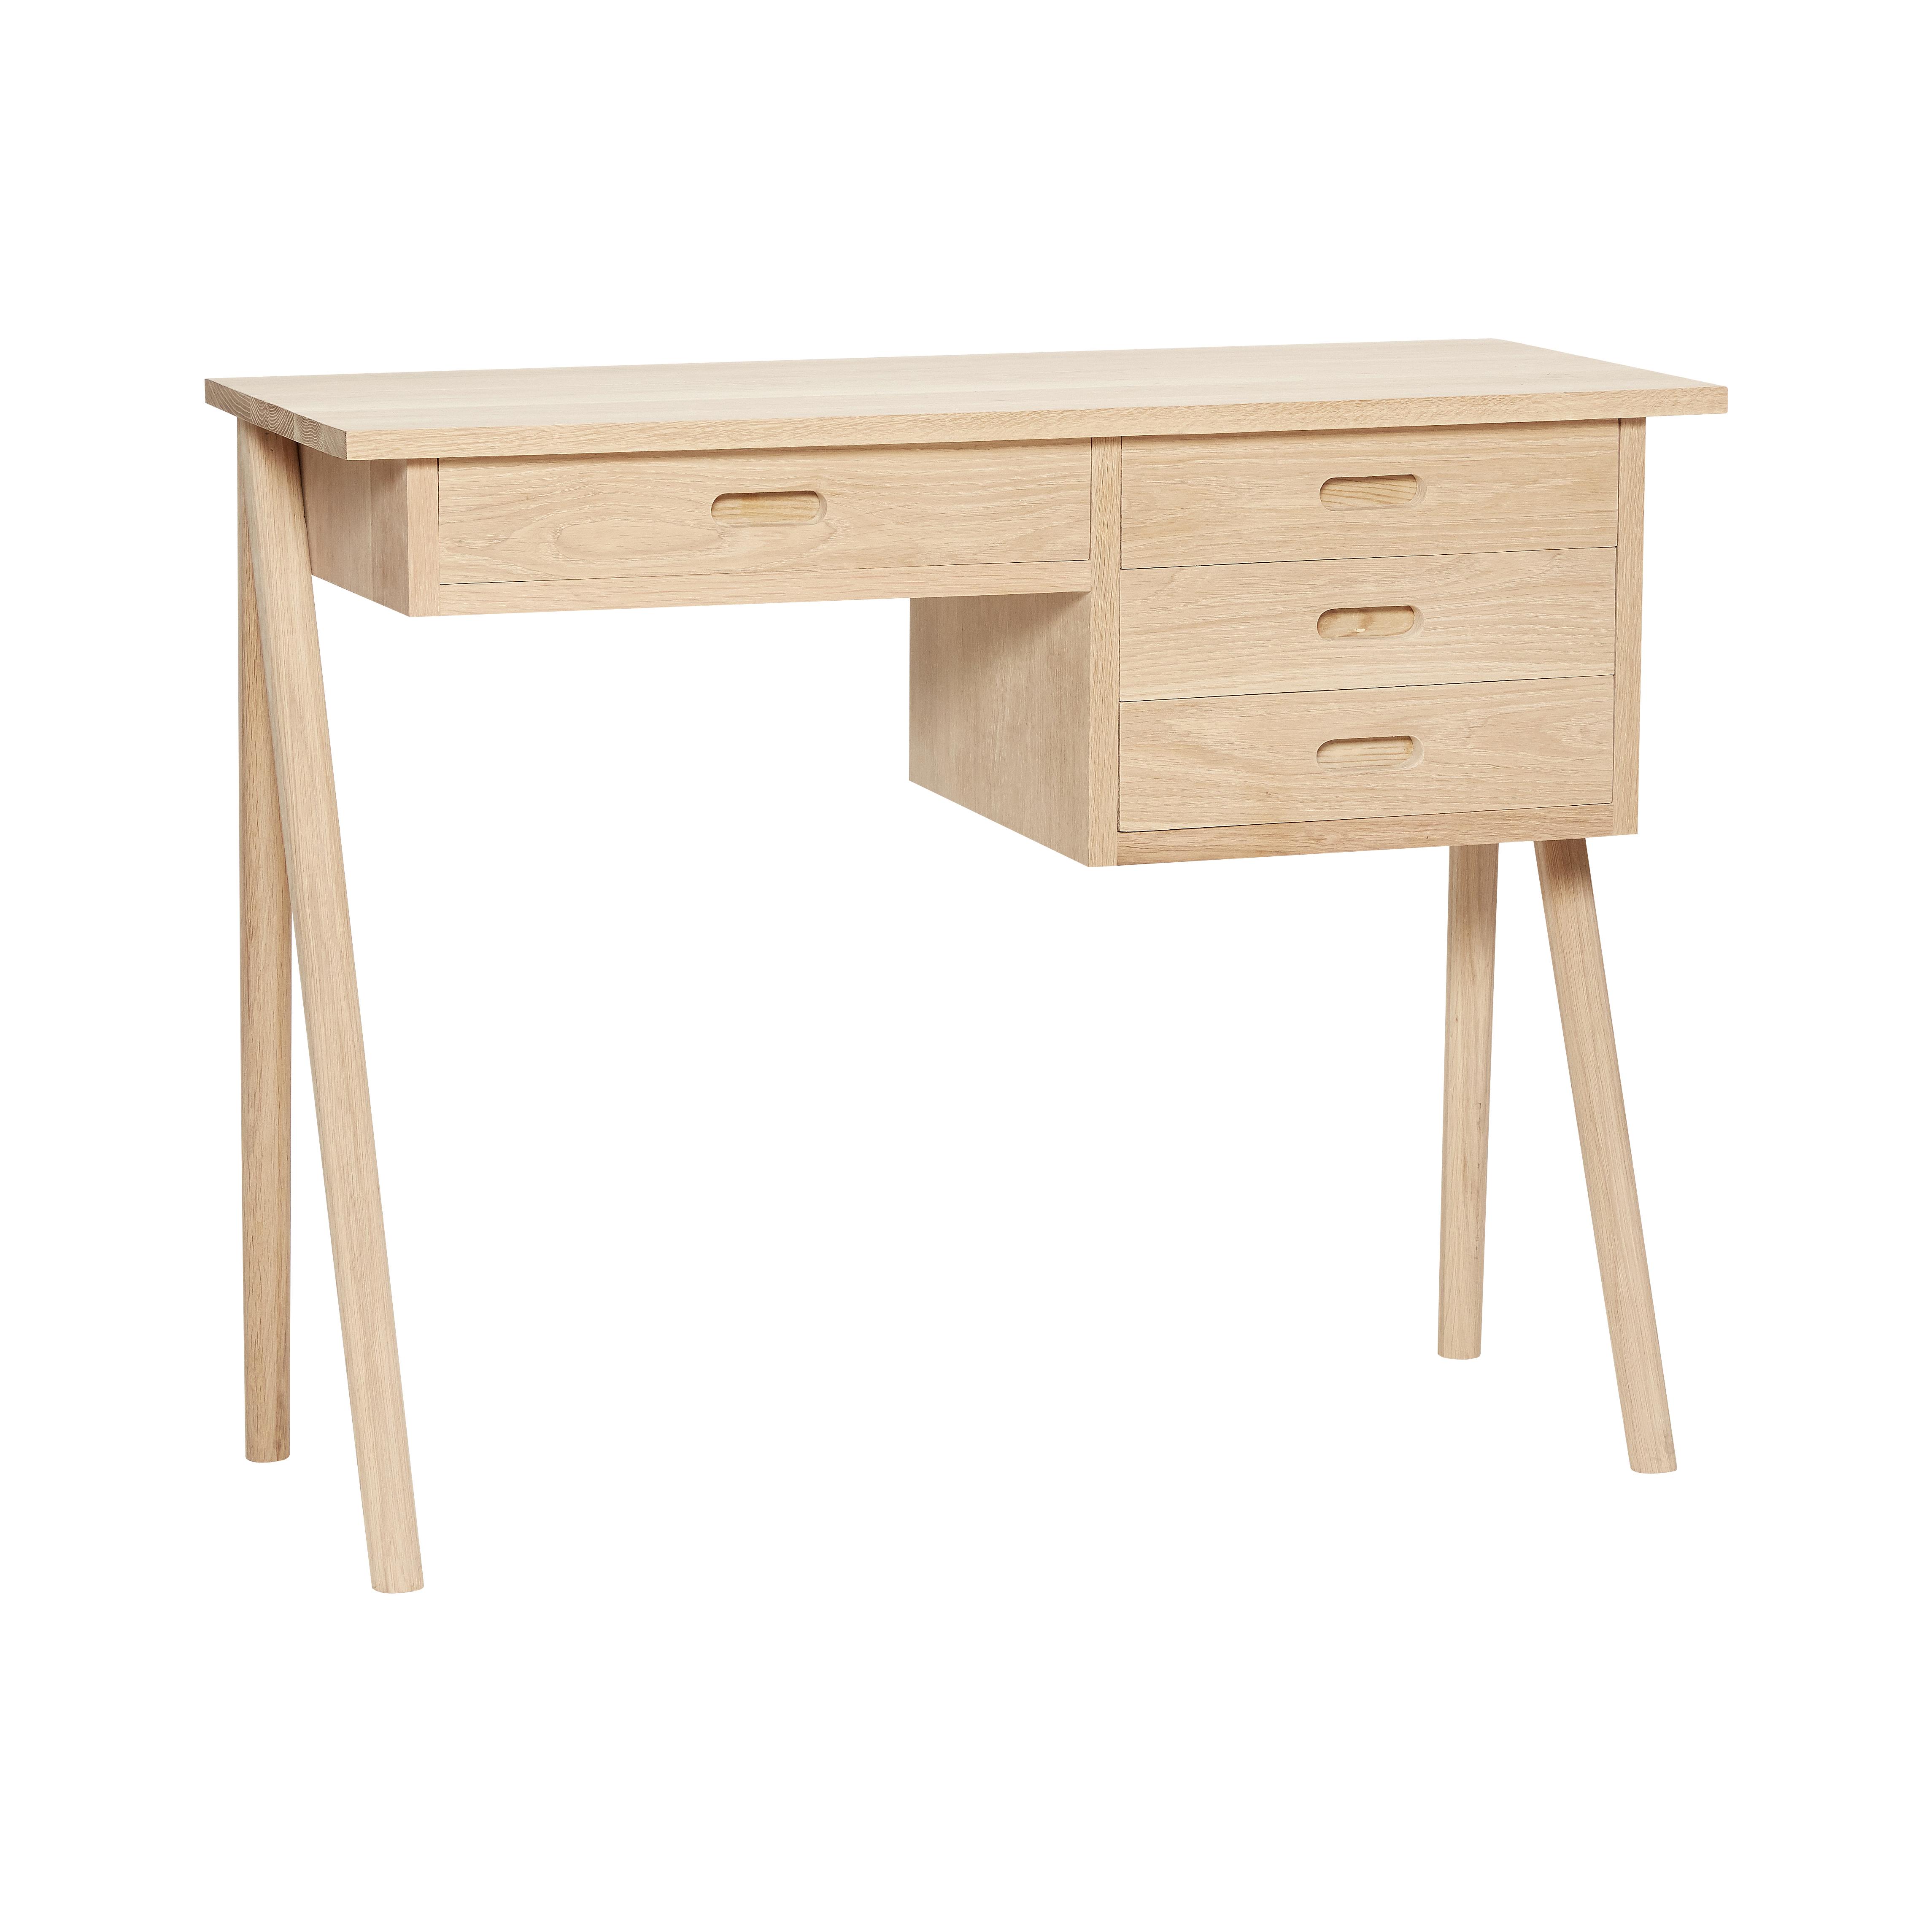 Image of   Hübsch Oscar skrivebord